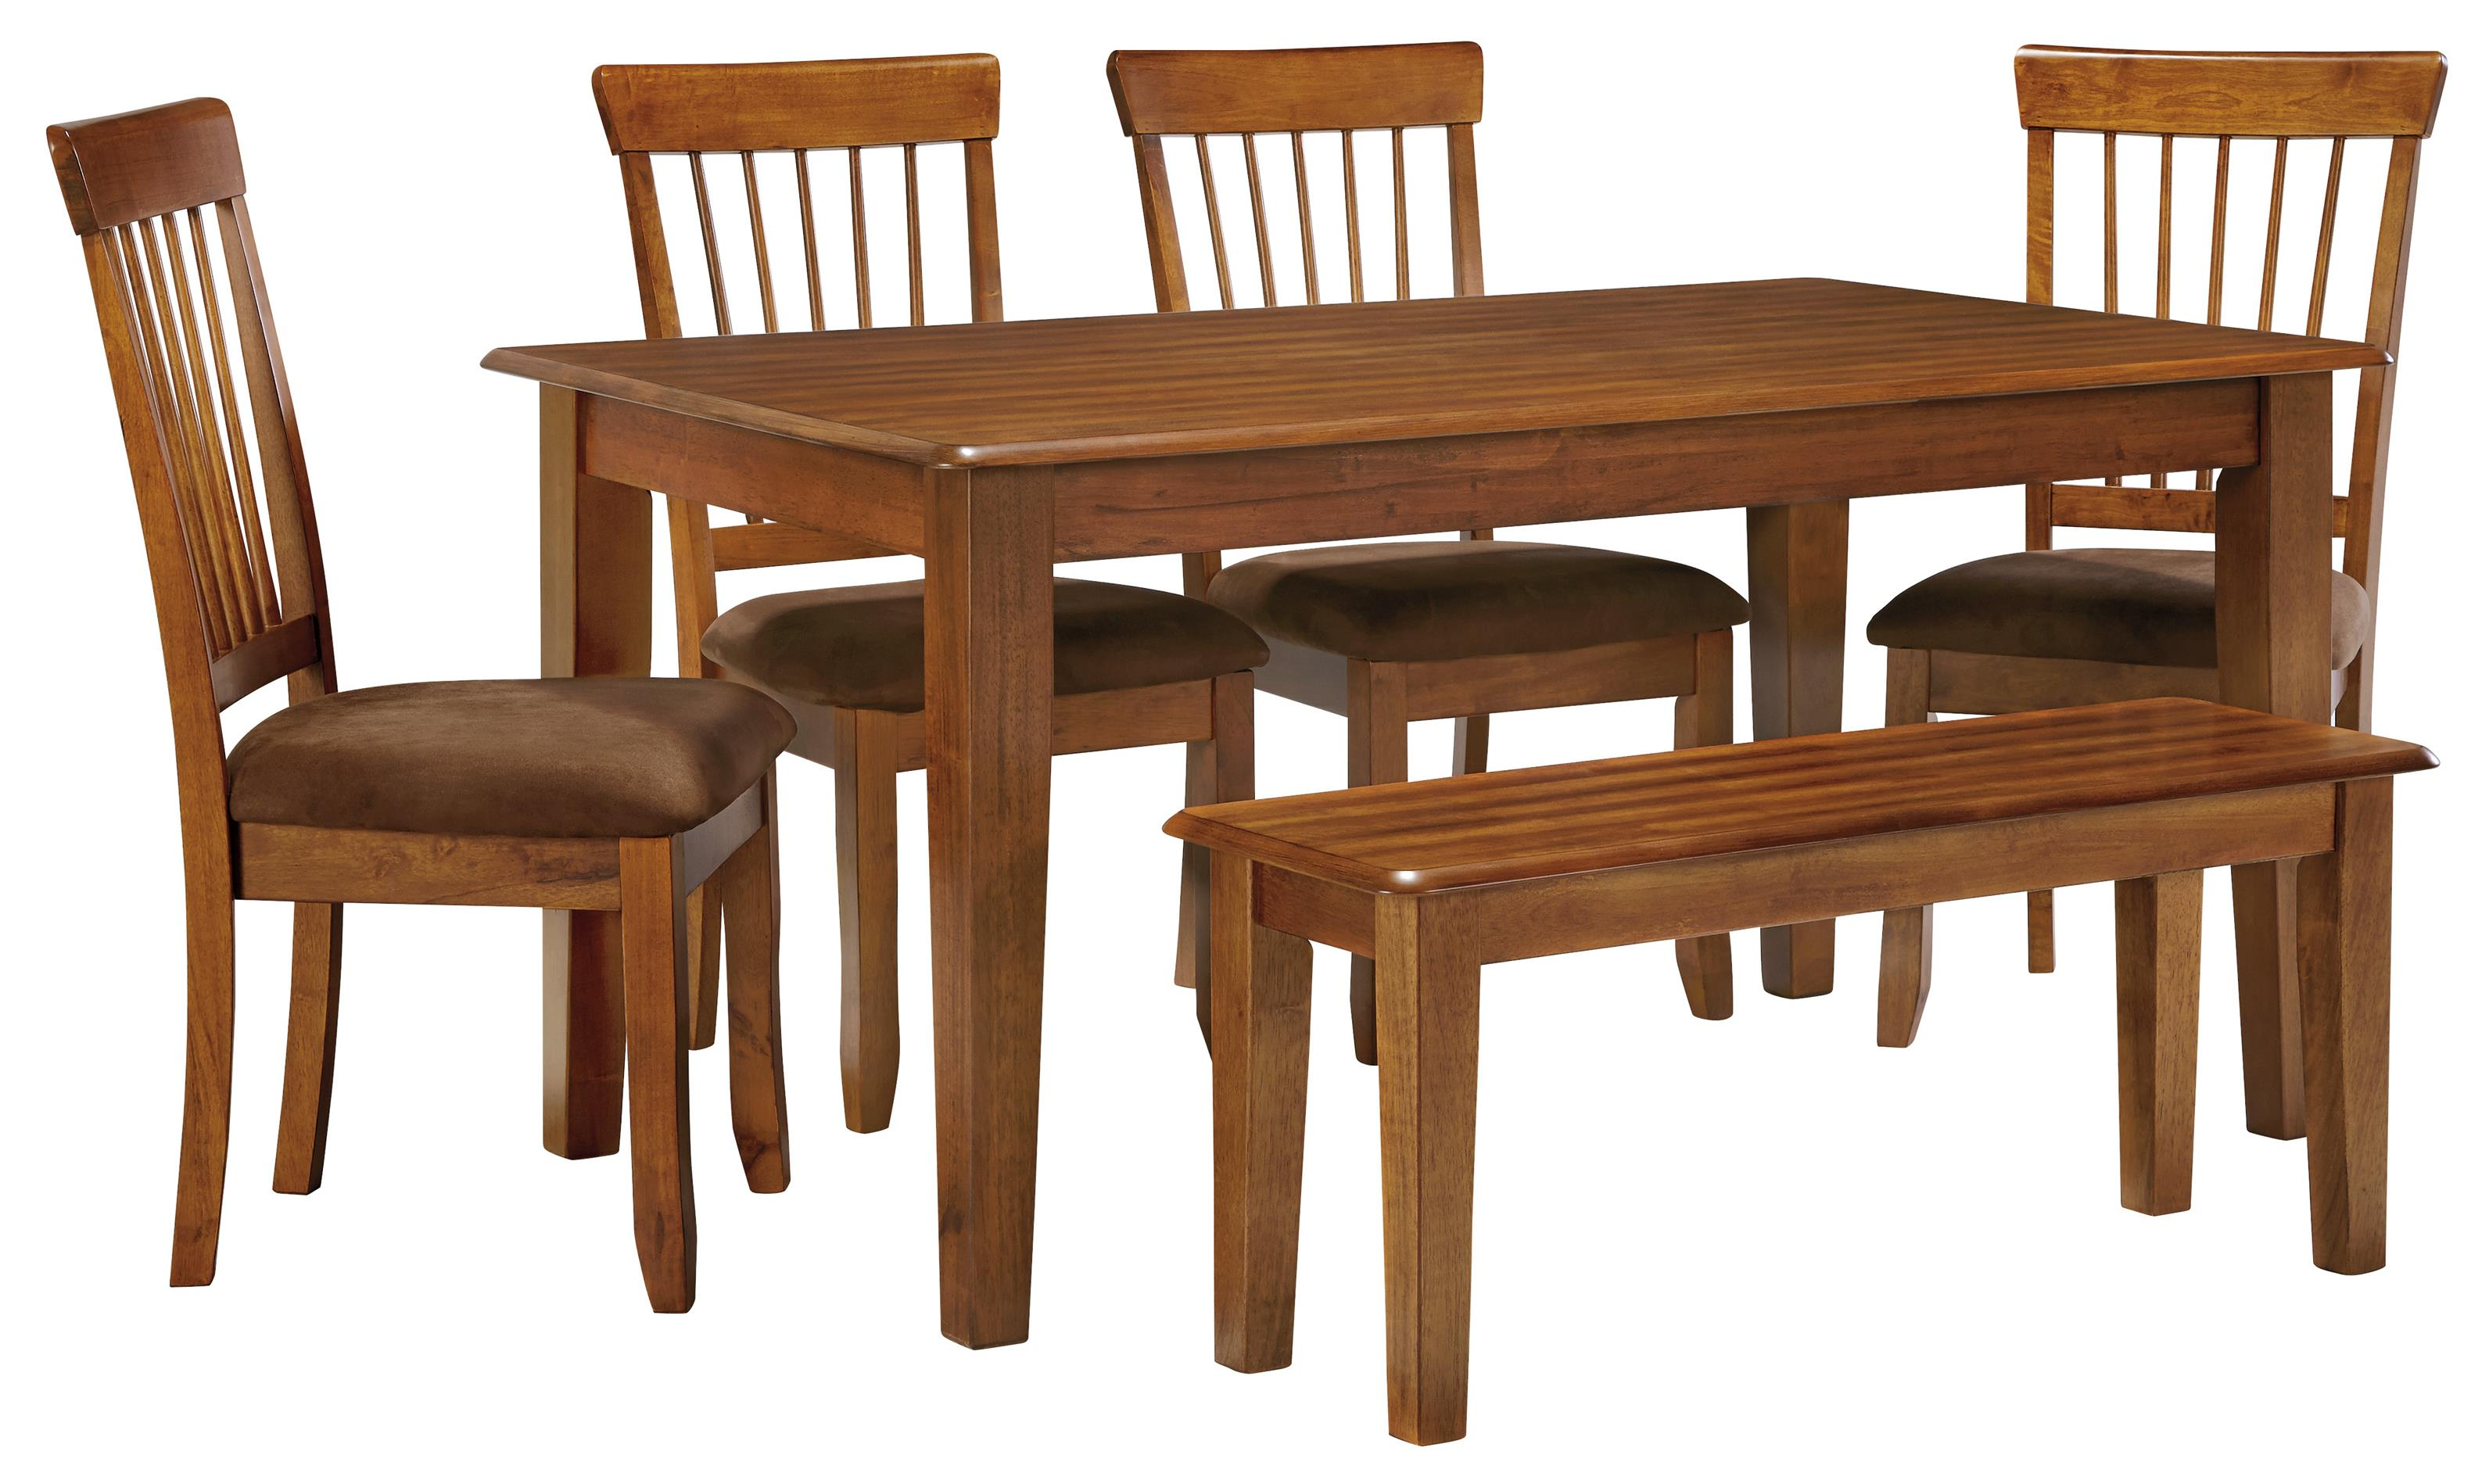 Berringer 6-Piece Dining Set by Ashley Furniture at HomeWorld Furniture